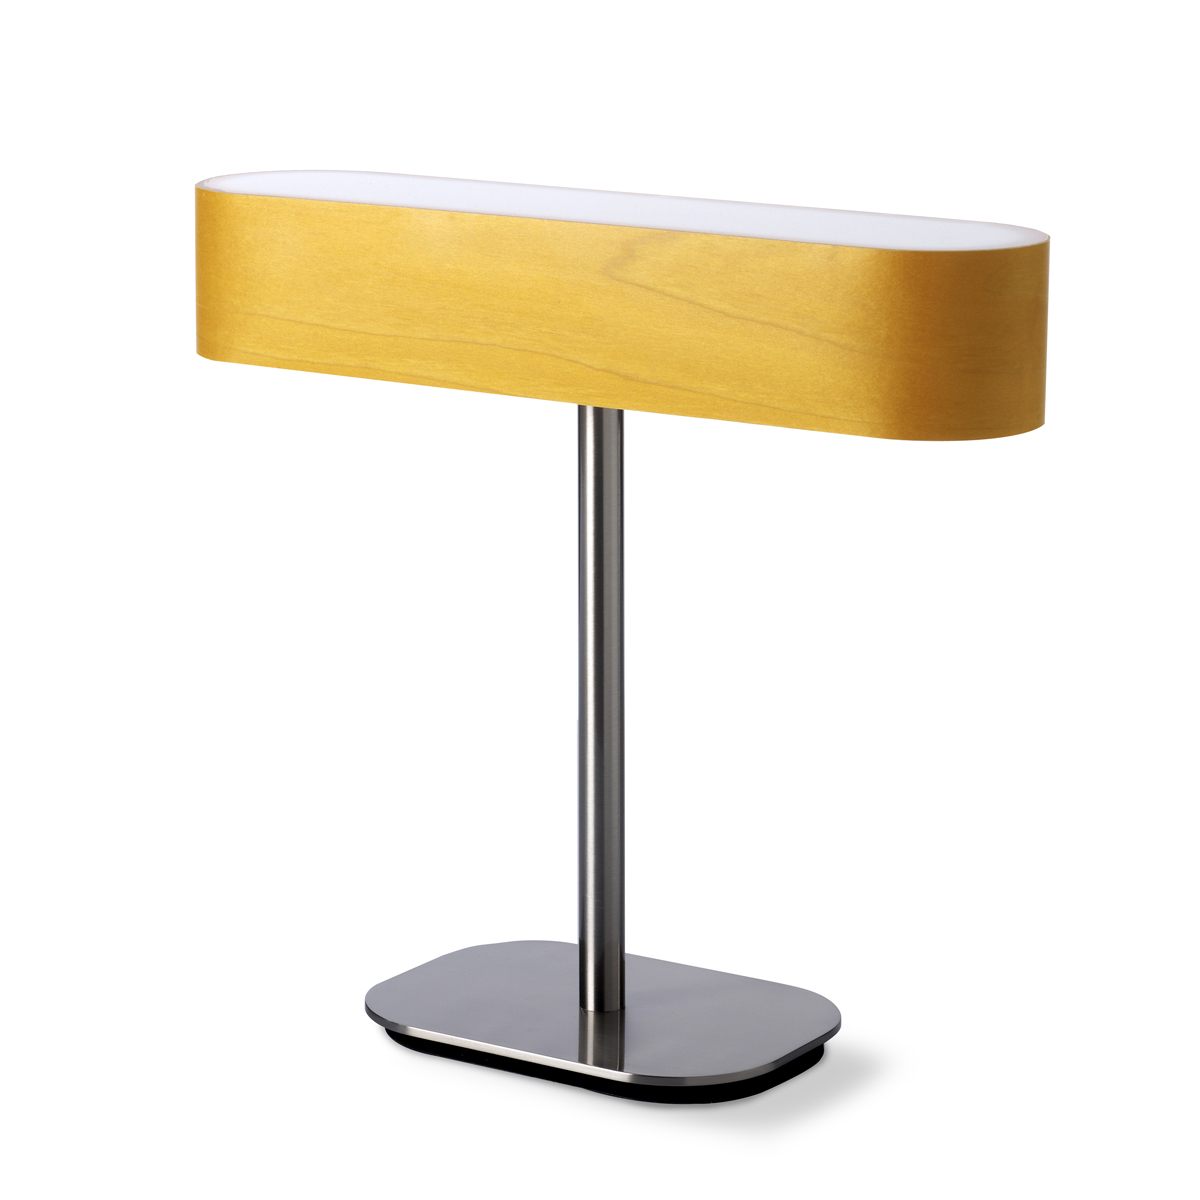 LZF Lamps I-Club LED Tischleuchte I M LED DIM 24